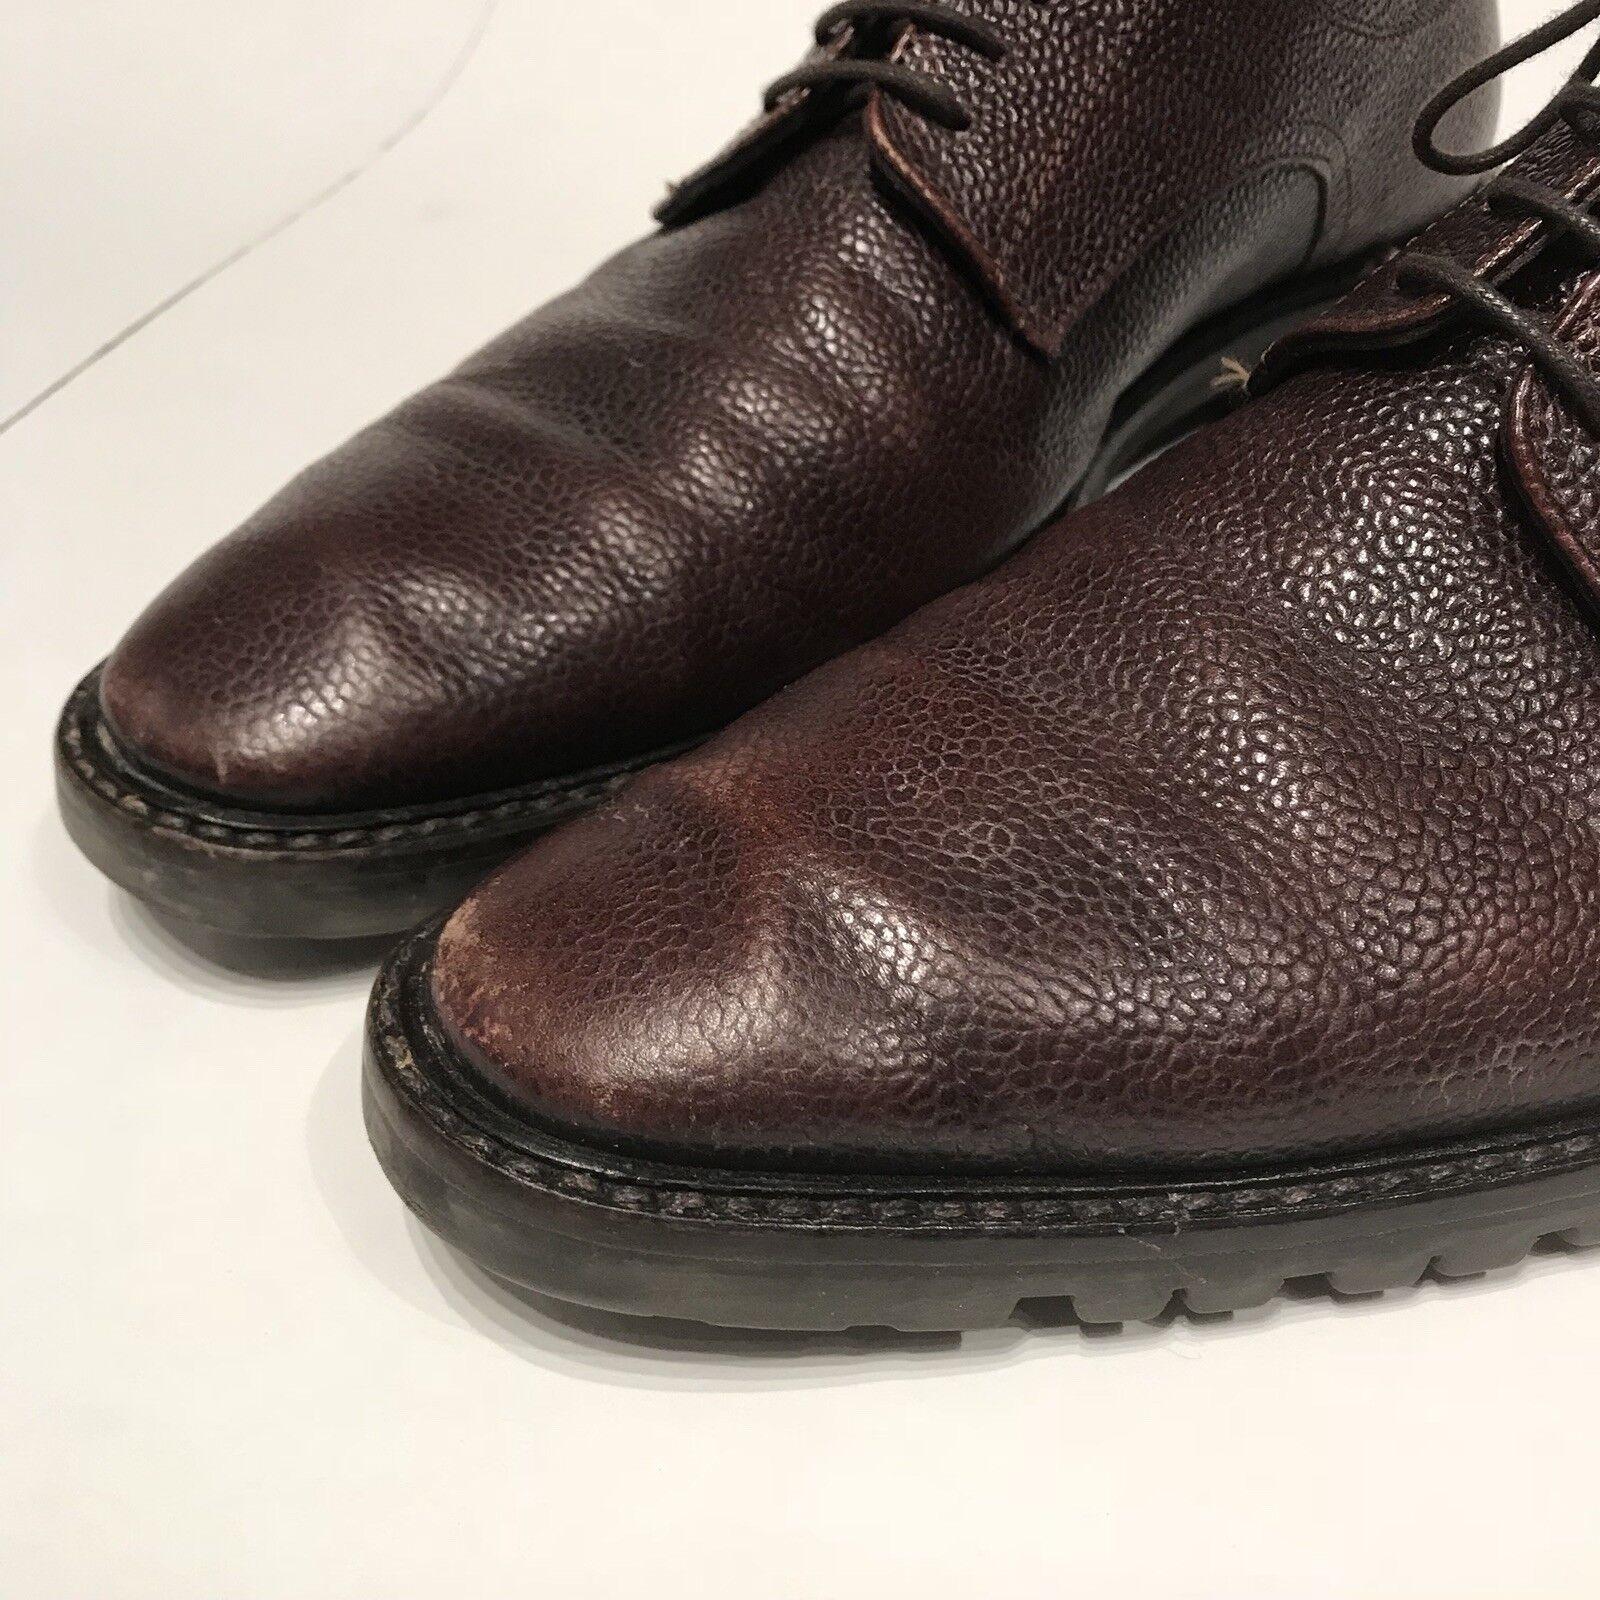 TO Stiefel NEW YORK ADAM DERRICK braun braun braun Leather Lace Up Lug Sole Oxford  US 9.5 61dbda